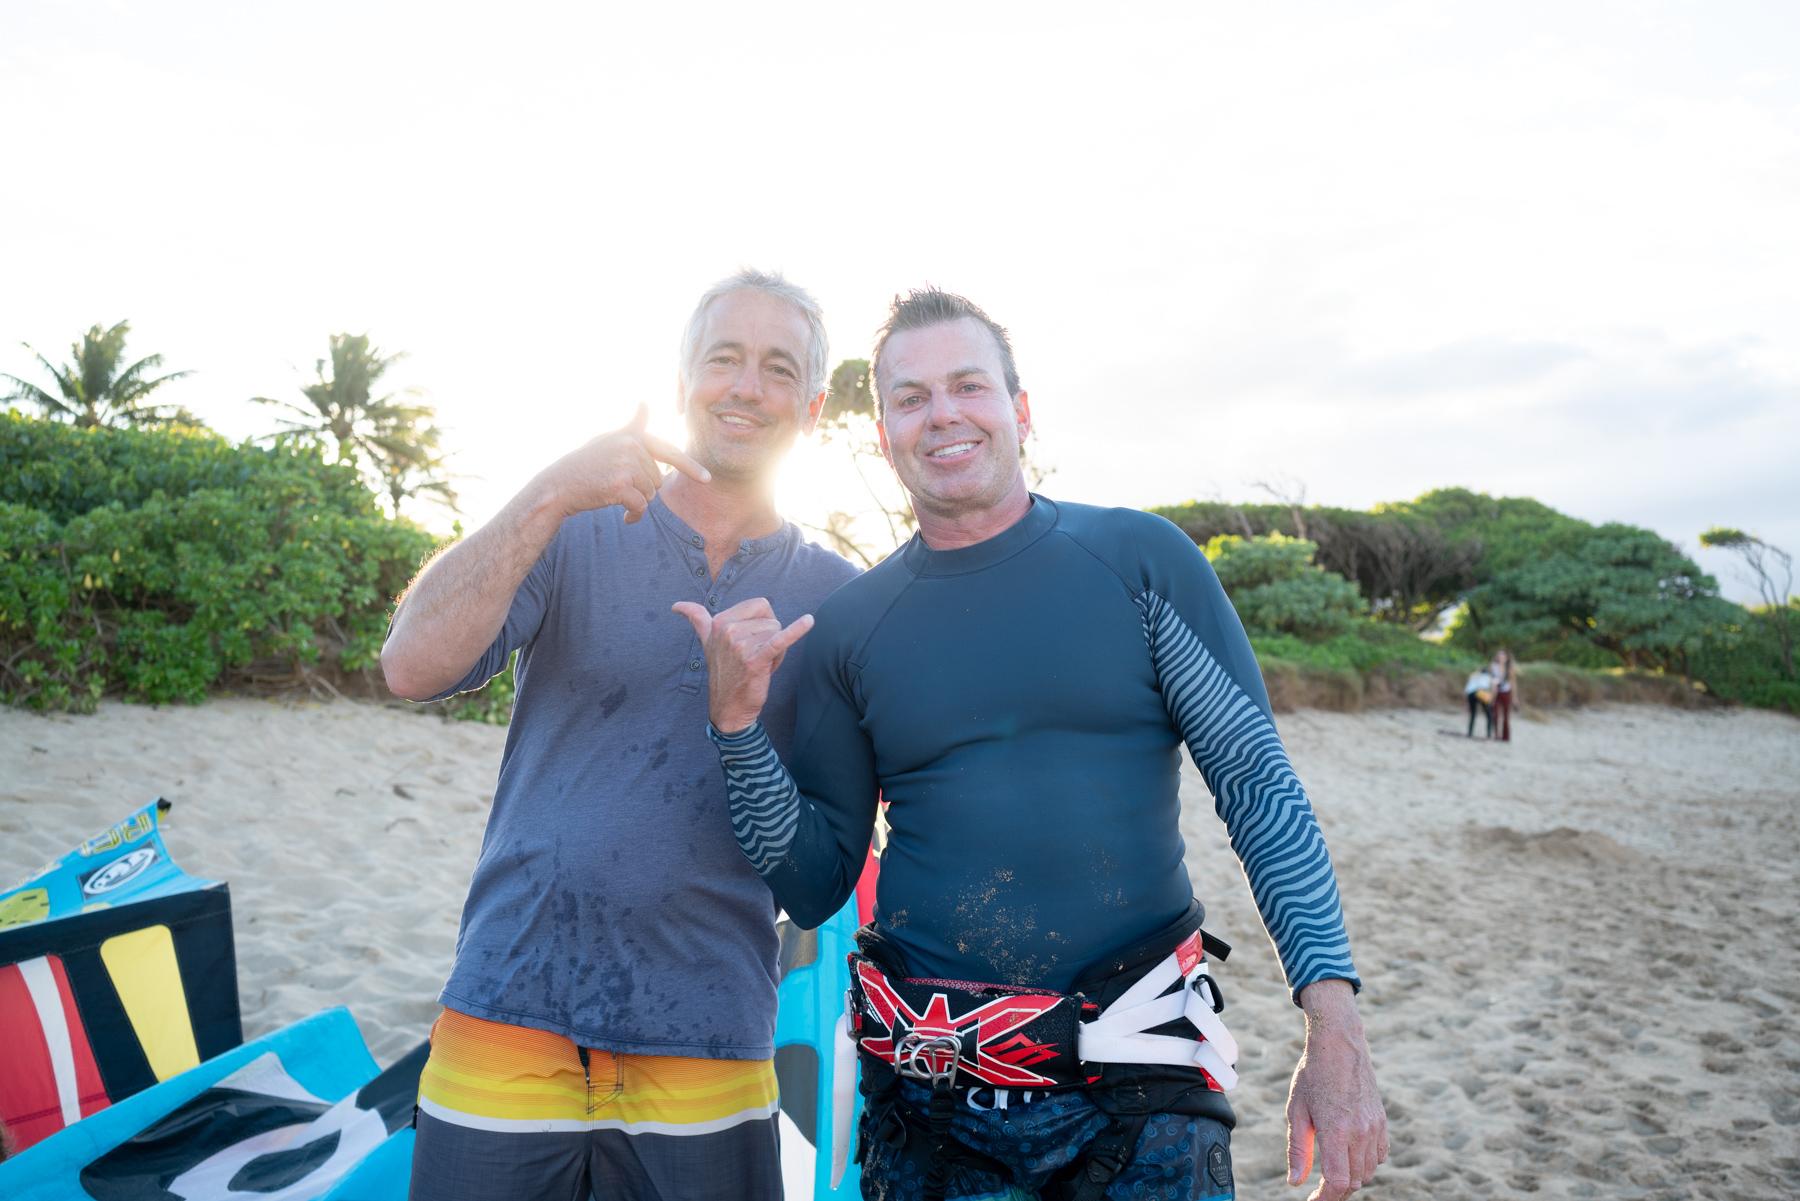 Maui-Trip-Kite-48.jpg